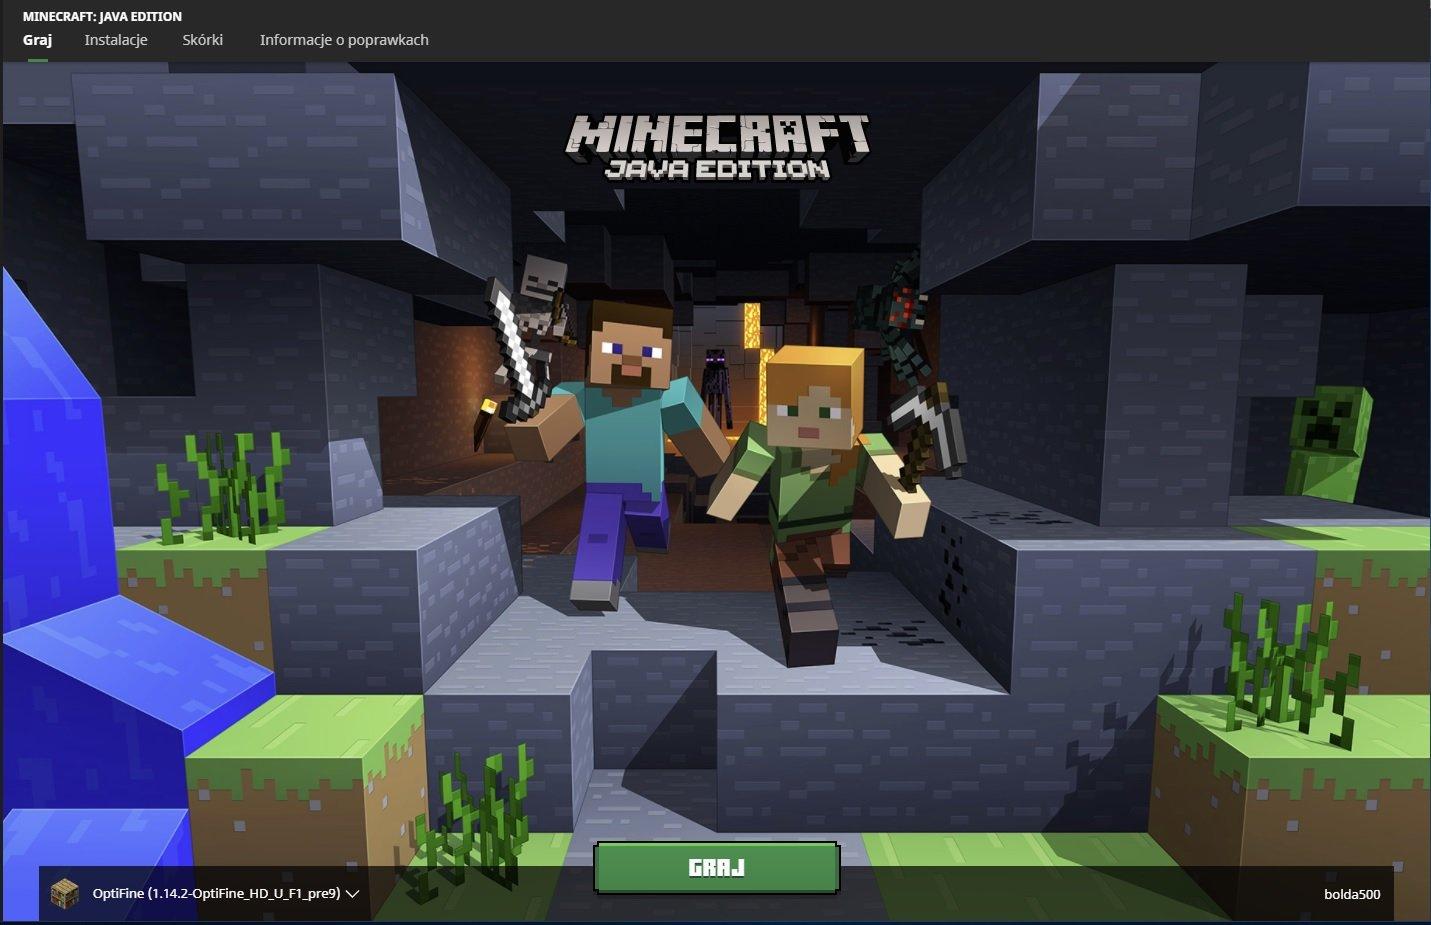 minecraft launcher zakladka graj